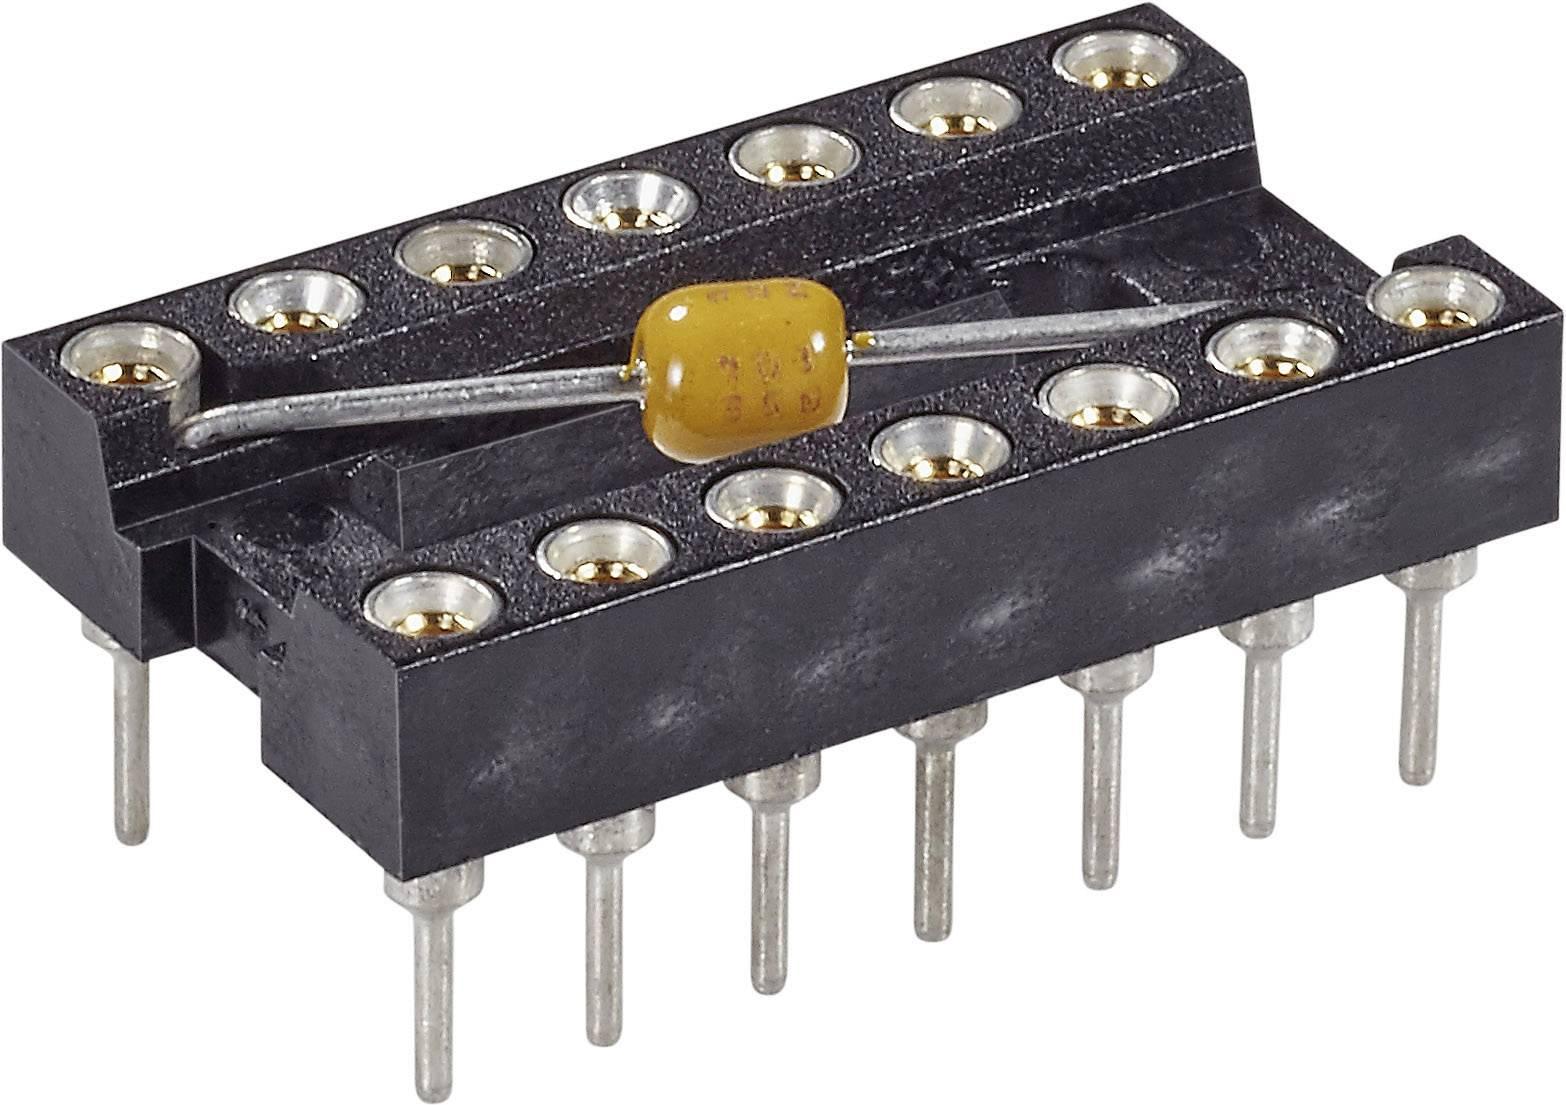 IC pätica MPE Garry MPQ 28.6 STG B 100 nFU presné kontakty, s kondenzátorom, rozteč 15.24 mm, pólů 28, 1 ks